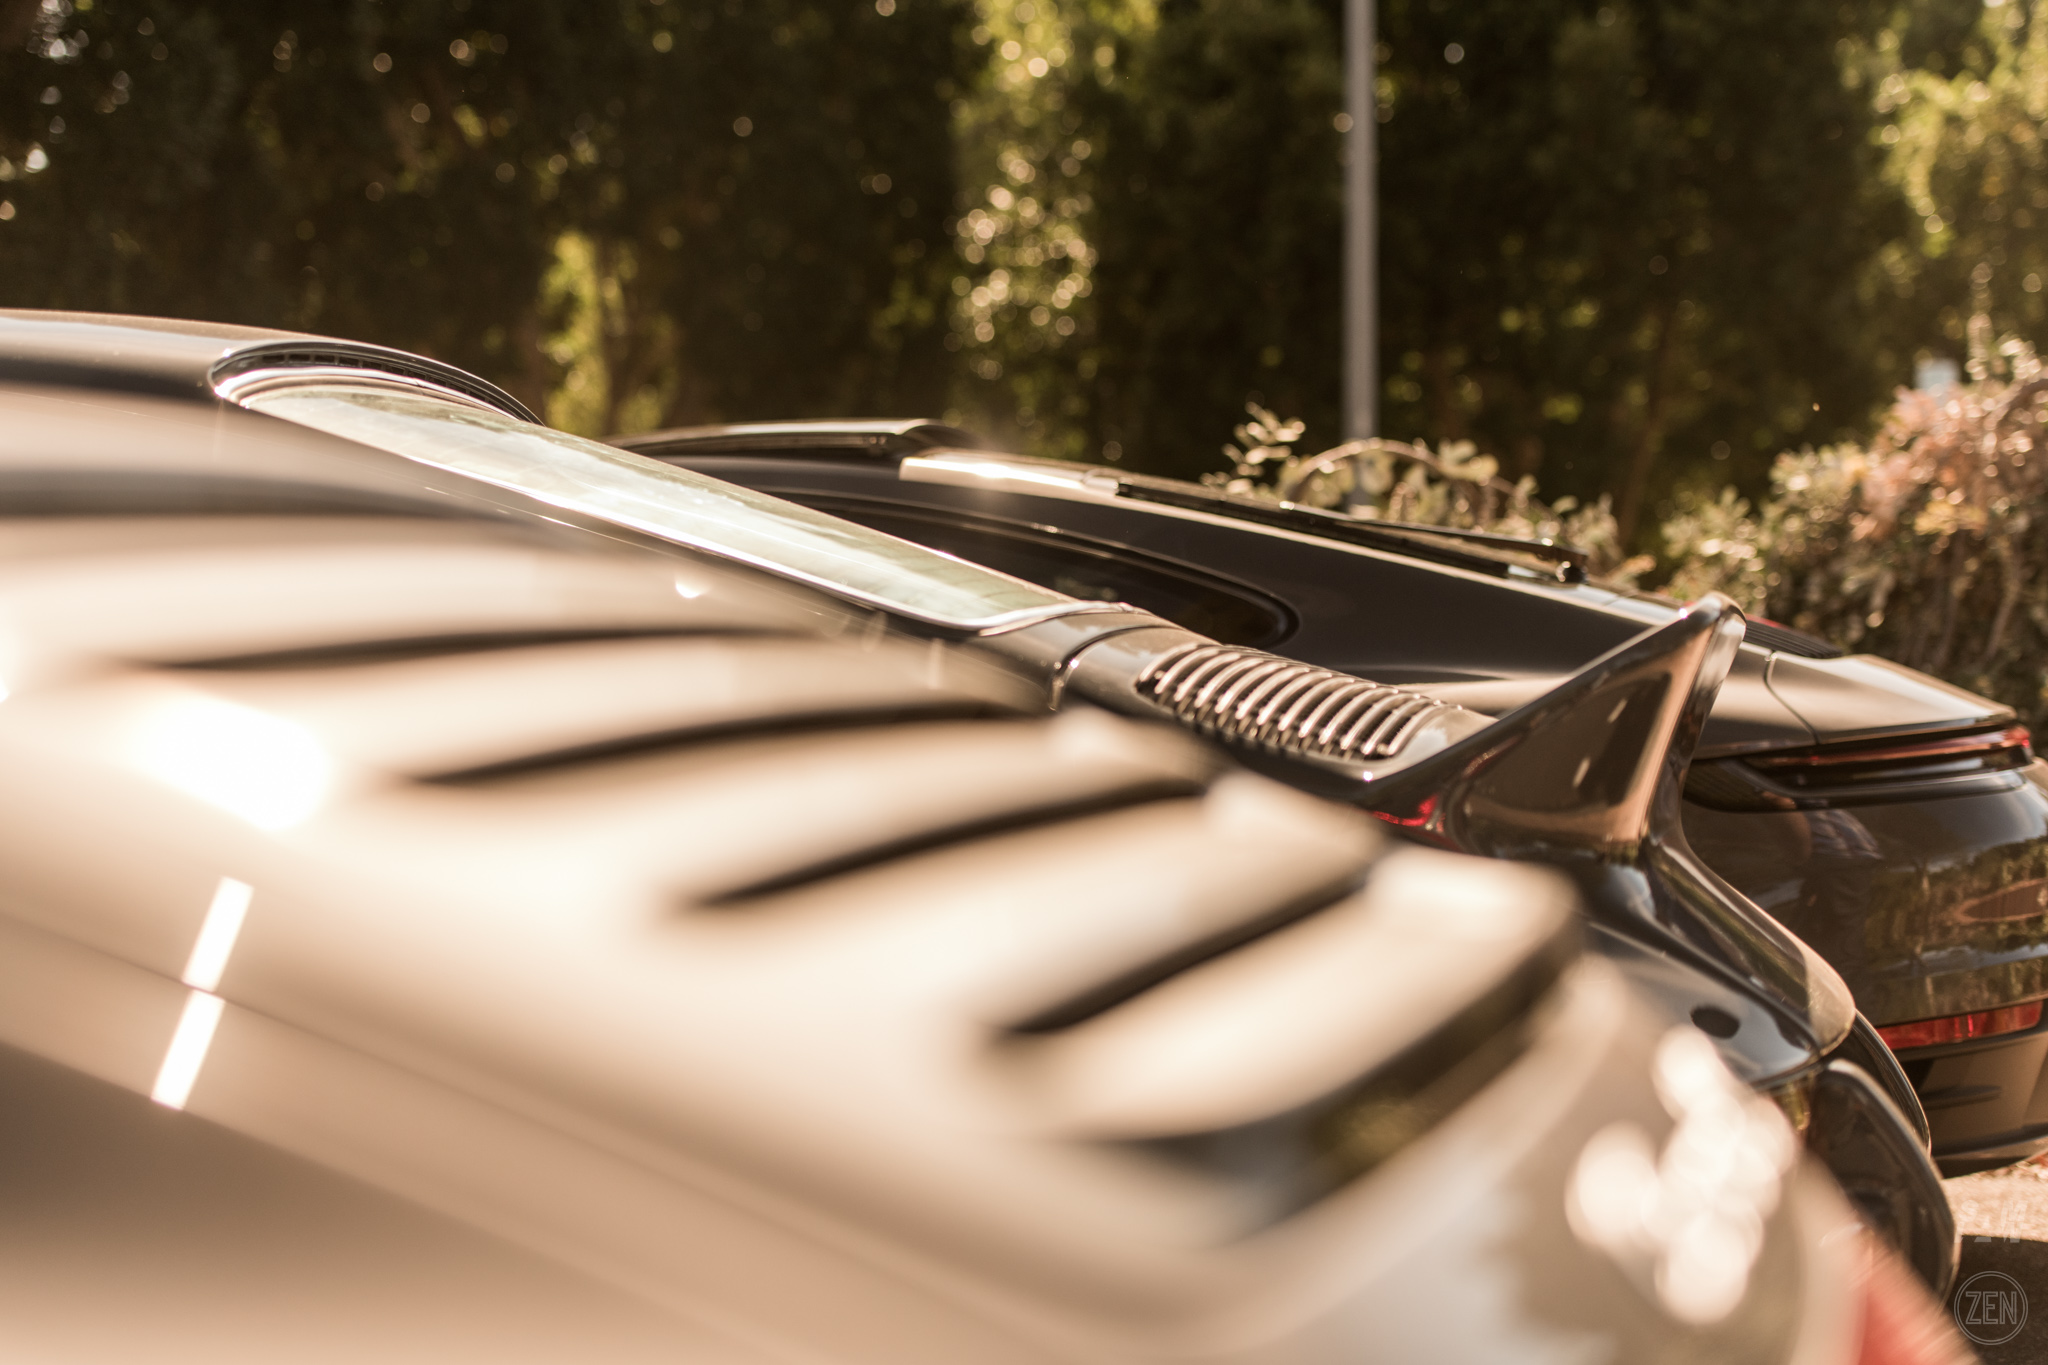 2019-10-27 - Autohaus Porsches & Coffee 151